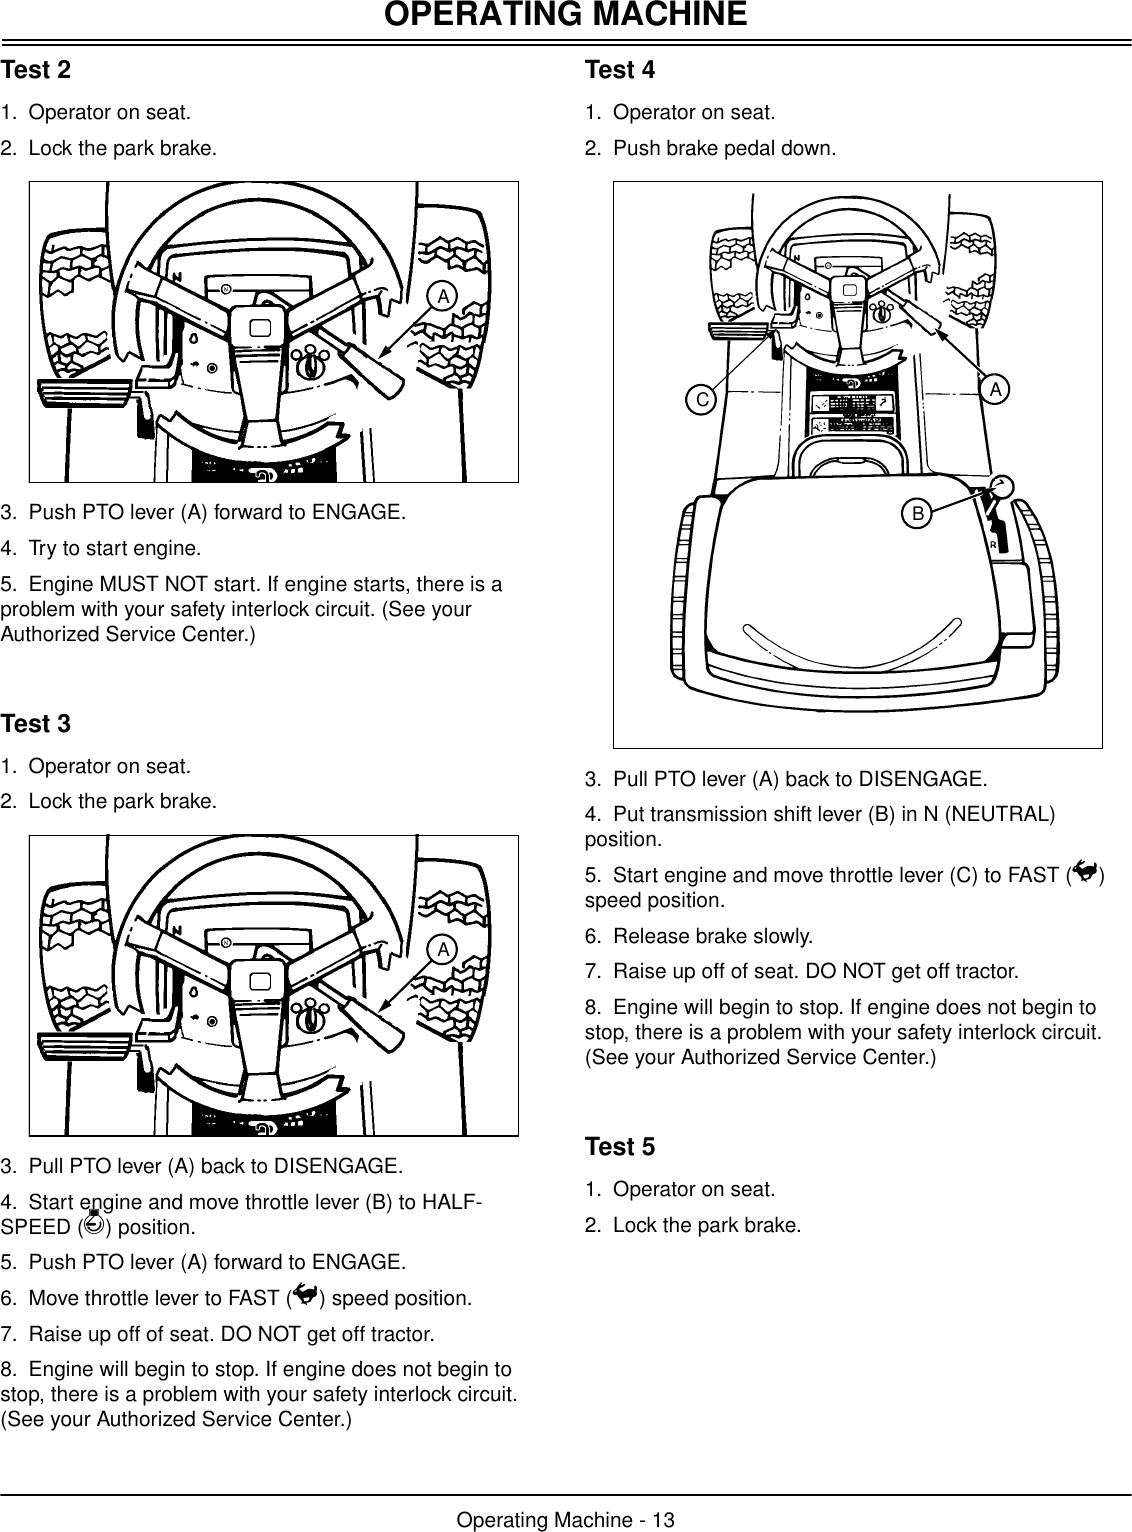 Scotts S1642 S1742 S2046 Operators Manual ManualsLib Makes